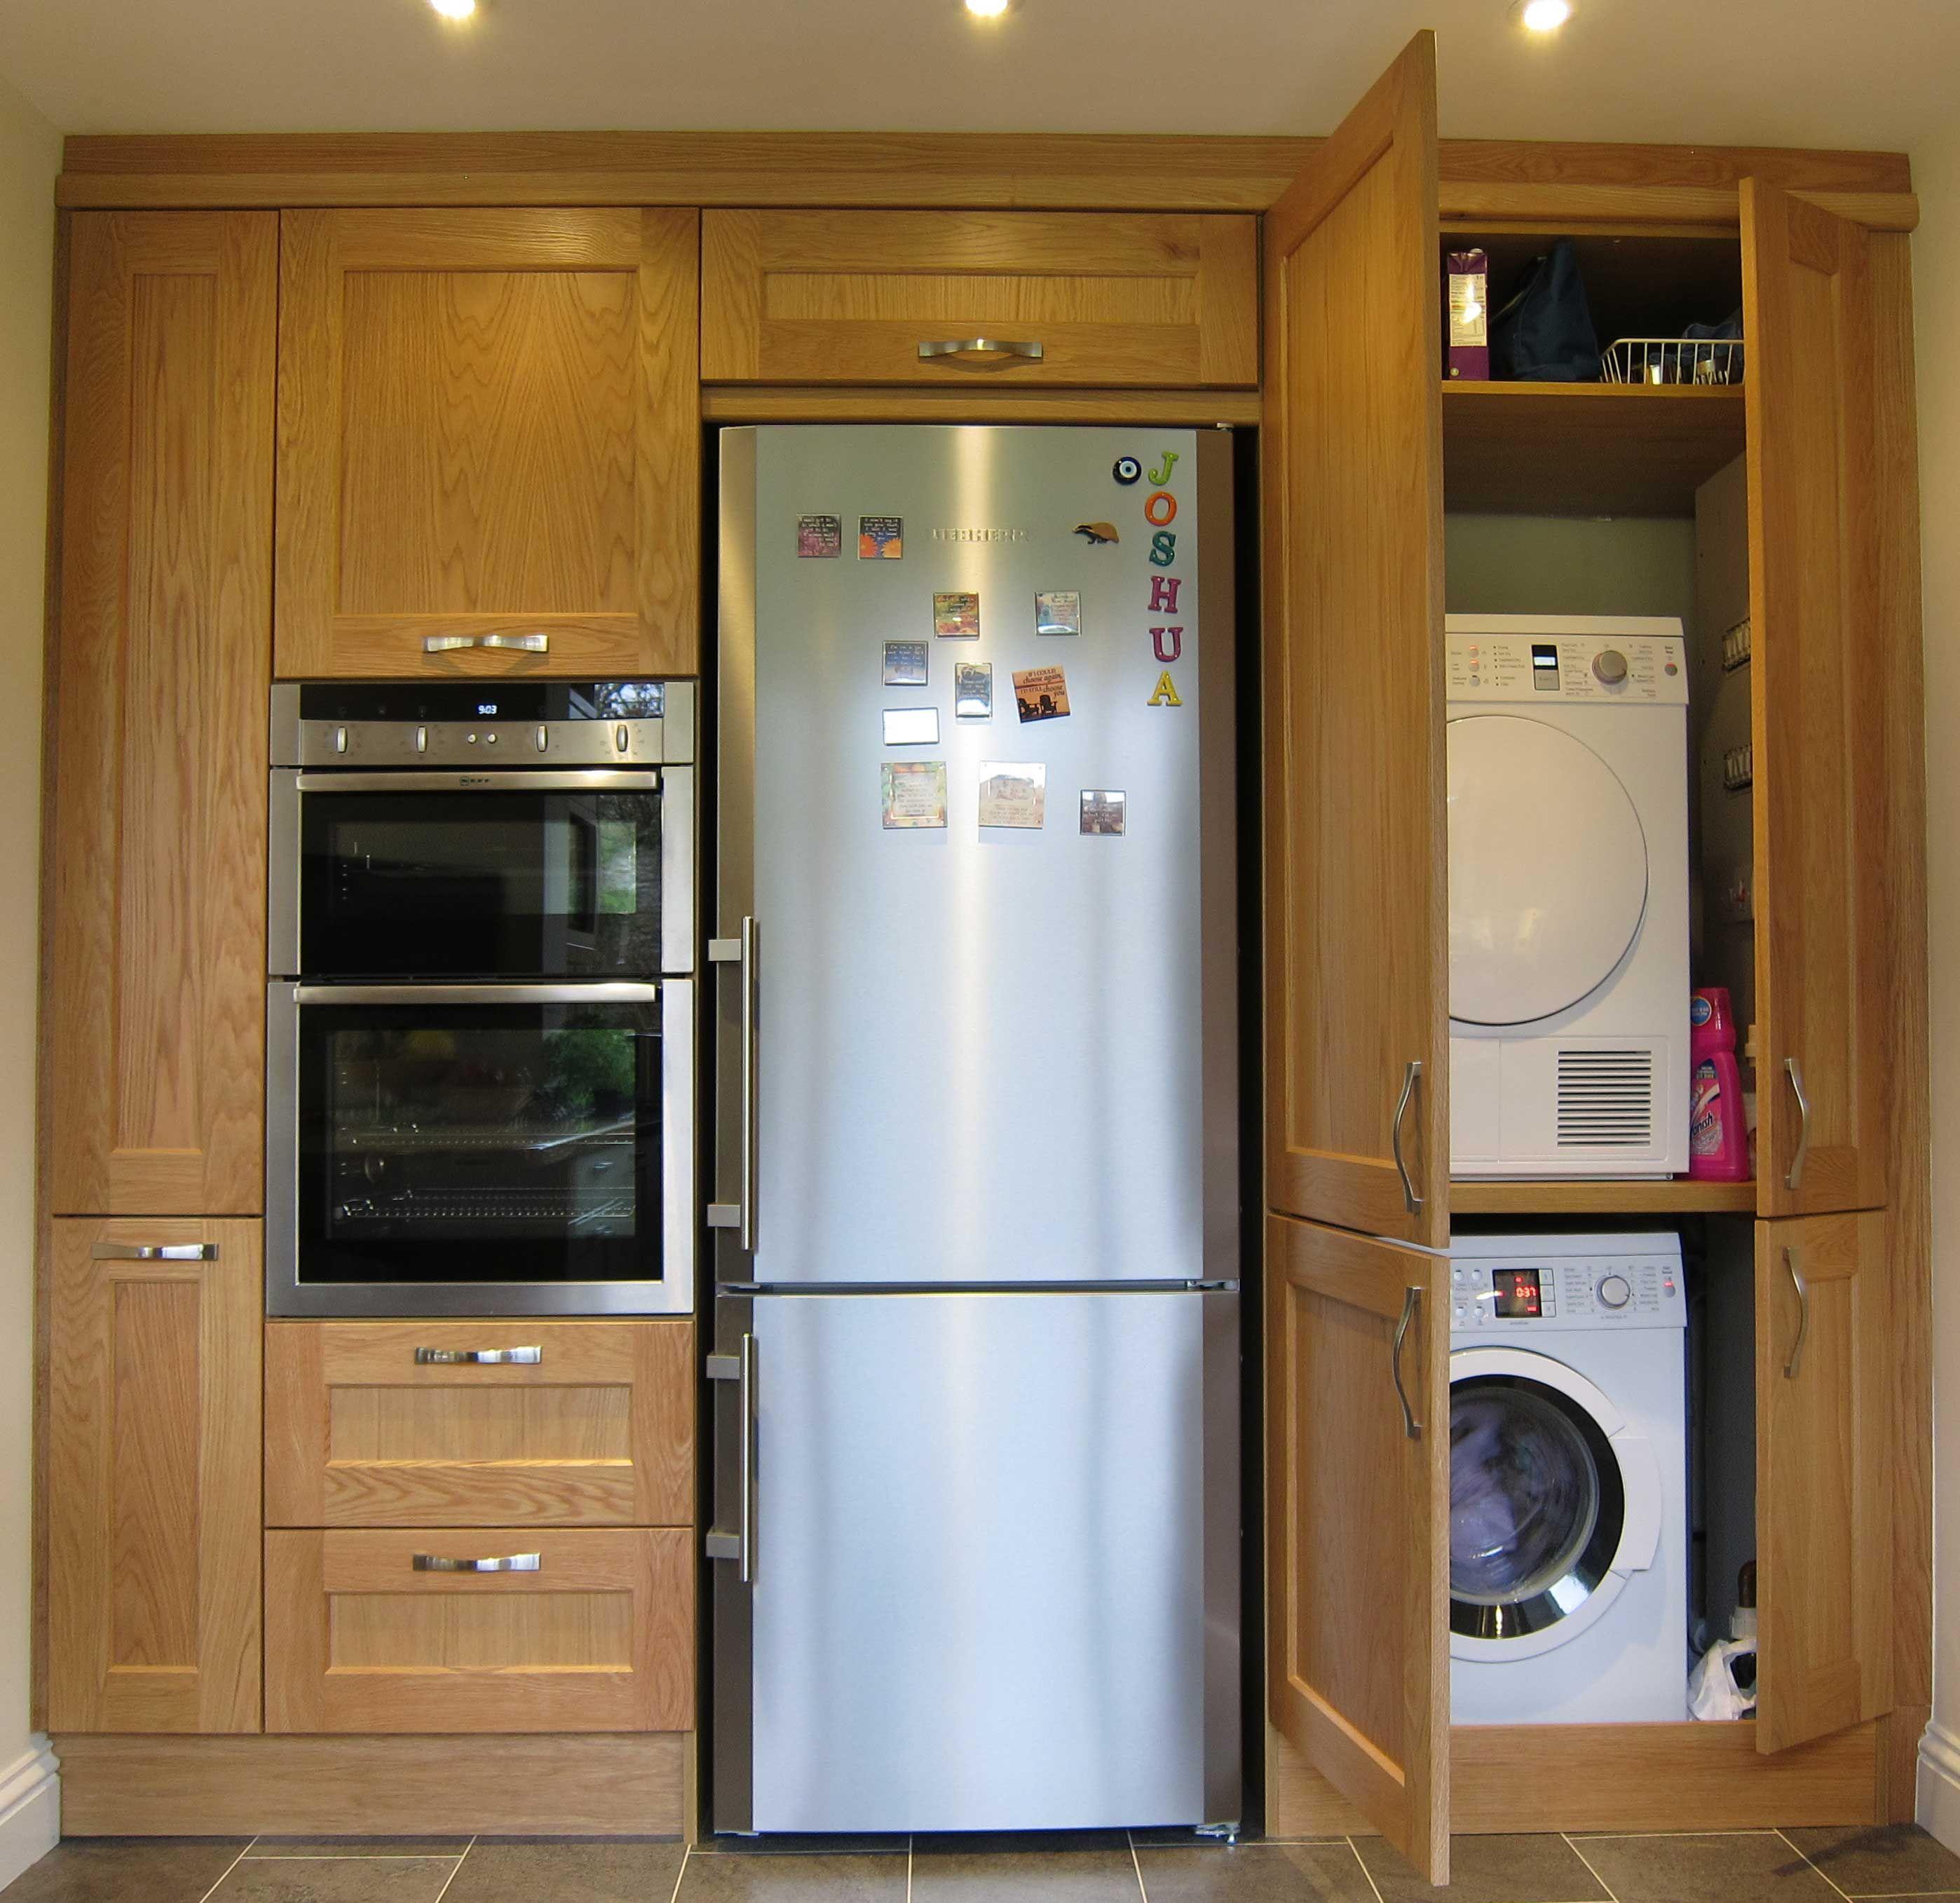 Washing Machine In Kitchen Design: Tumble Dryer On Top Of Washing Machine